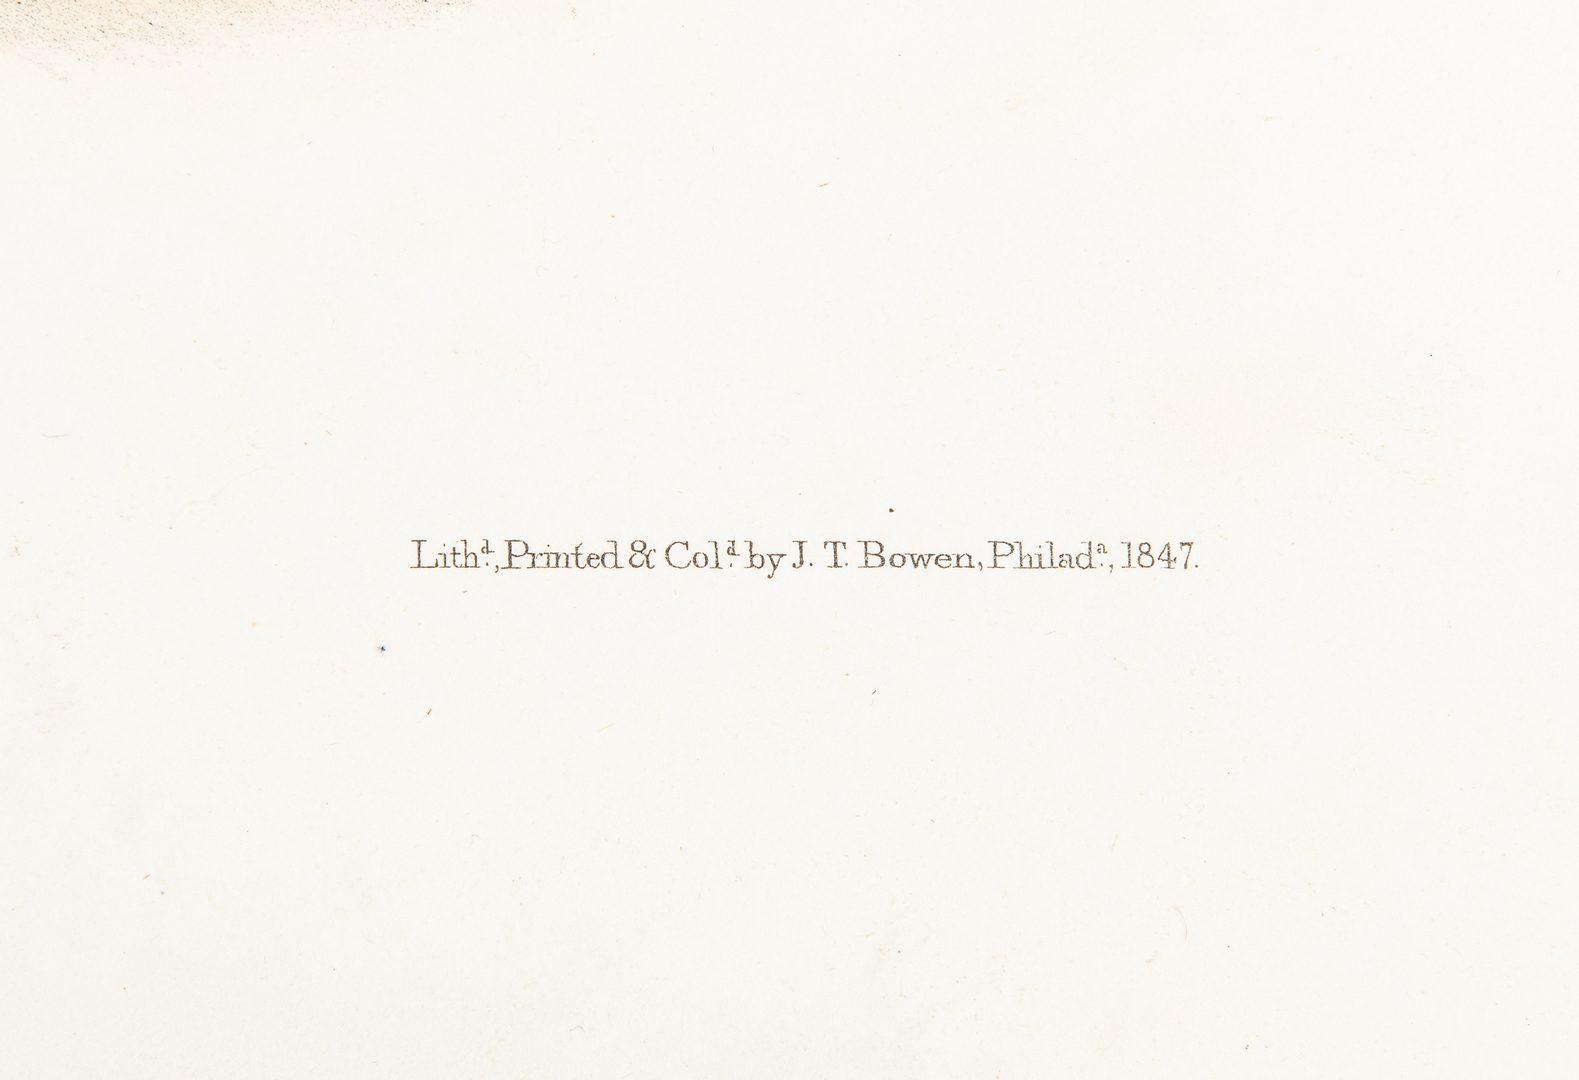 Lot 738: 2 Bowen Audubon Folios, Animals & 17 Octavo Ed, 21 items